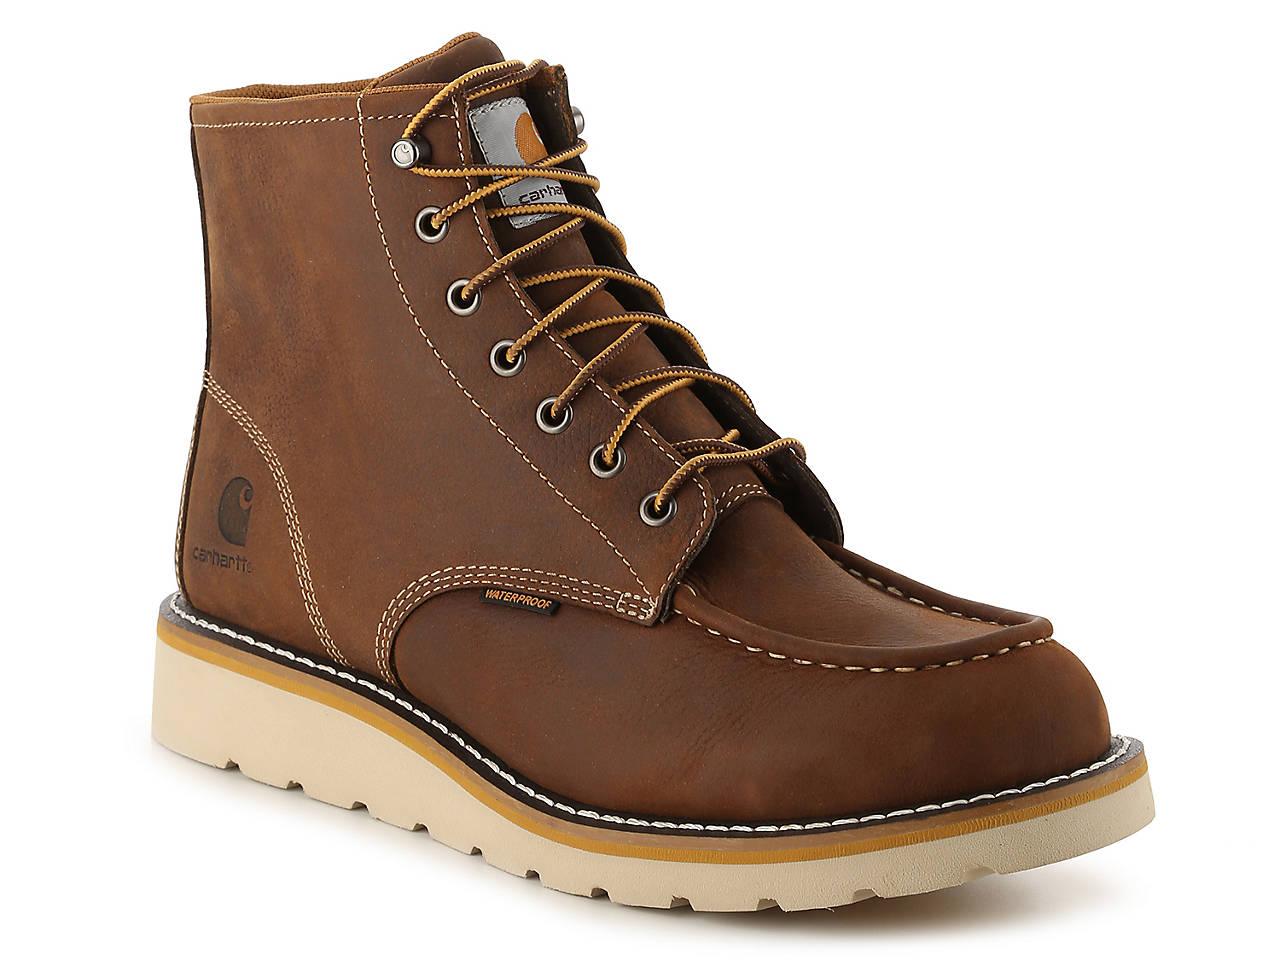 49dc0b9c8073 Carhartt 6-Inch Wedge Boot Men s Shoes